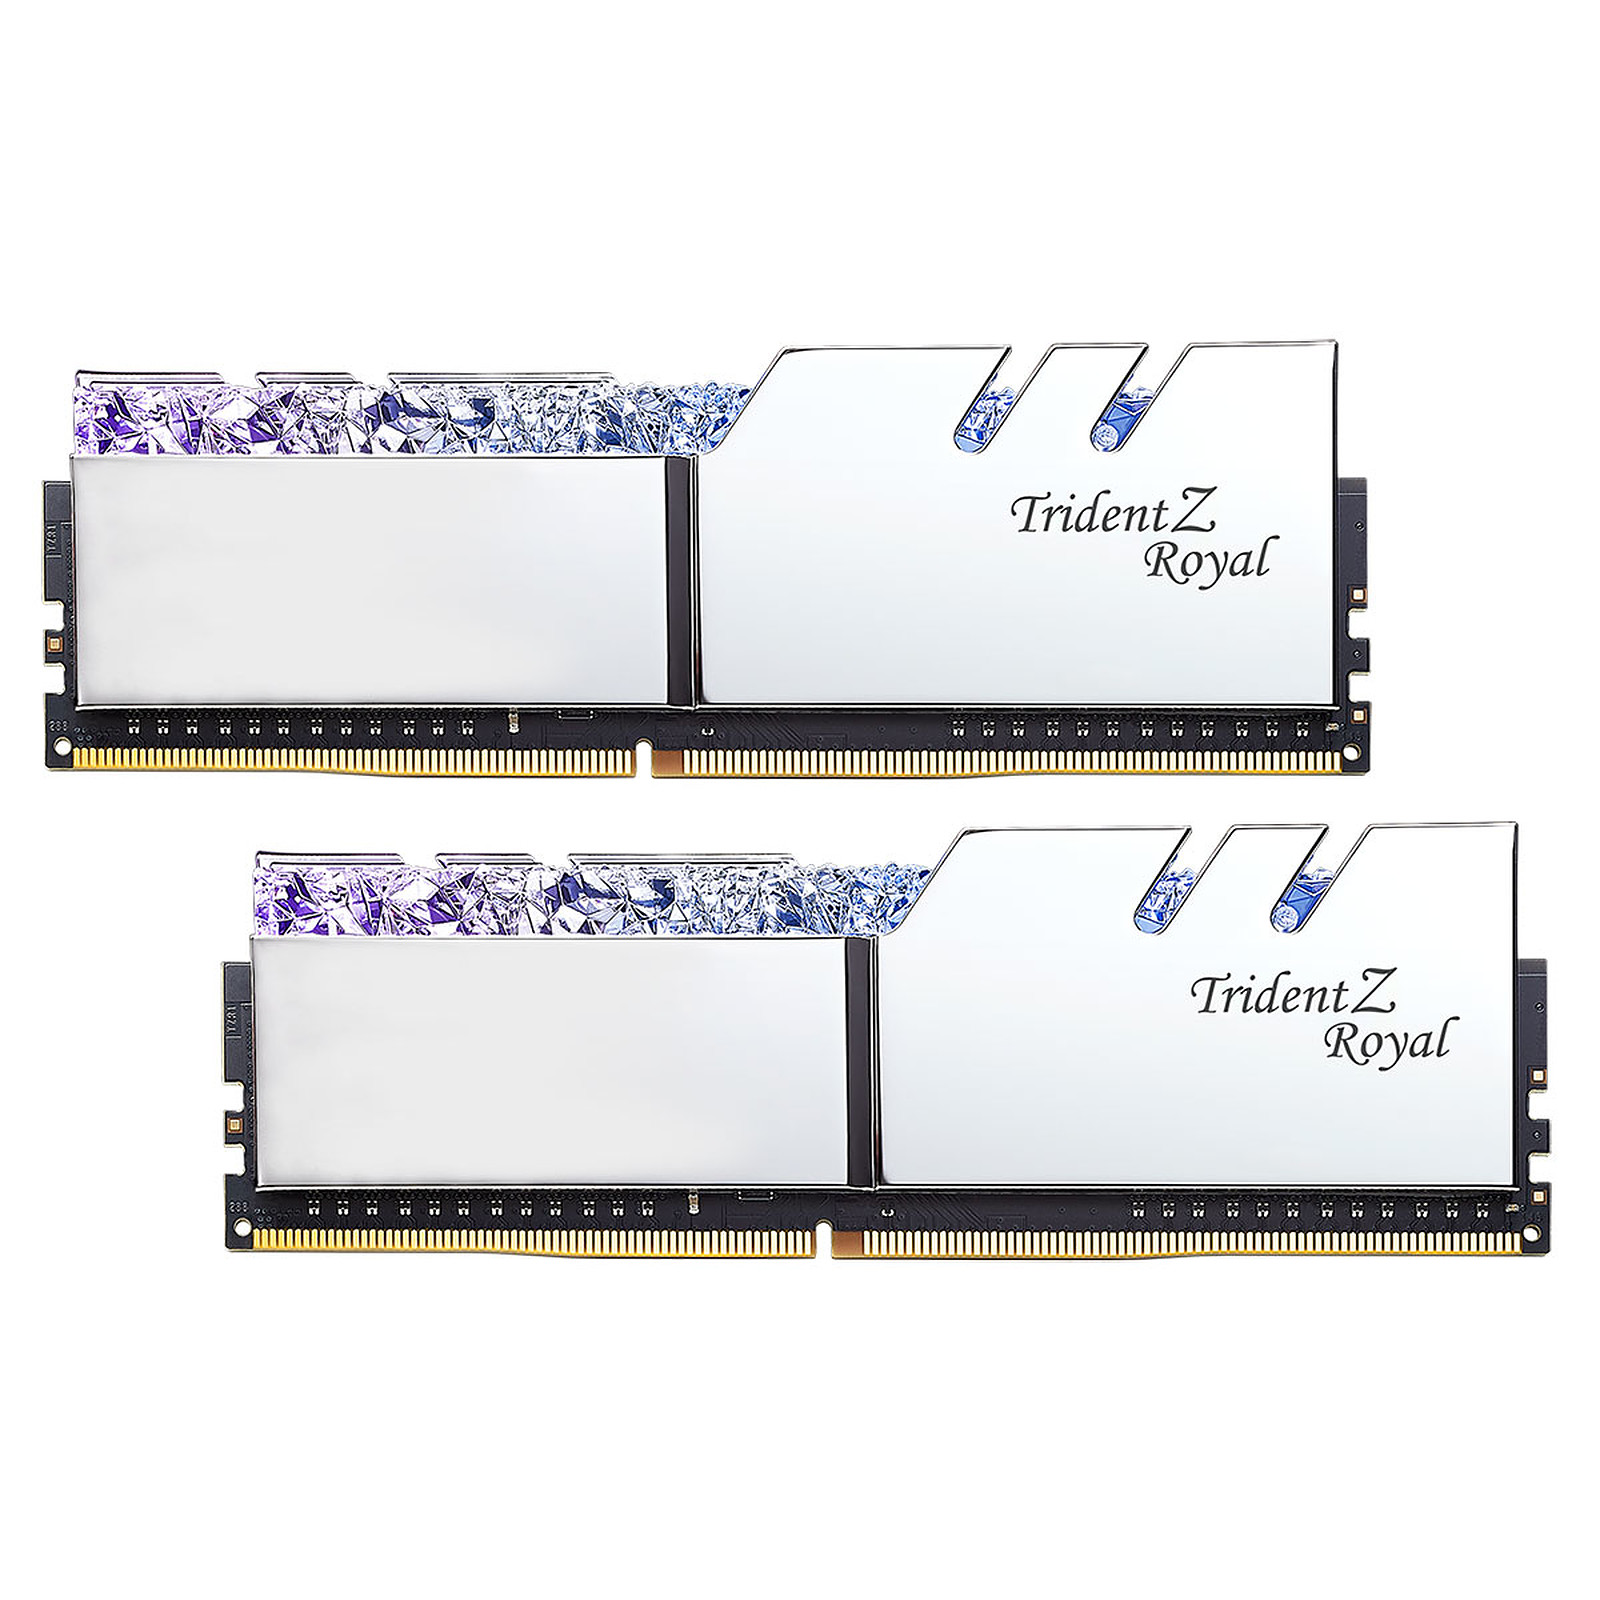 G.Skill Trident Z Royal 32 GB (2 x 16 GB) DDR4 4000 MHz CL17 - Plata